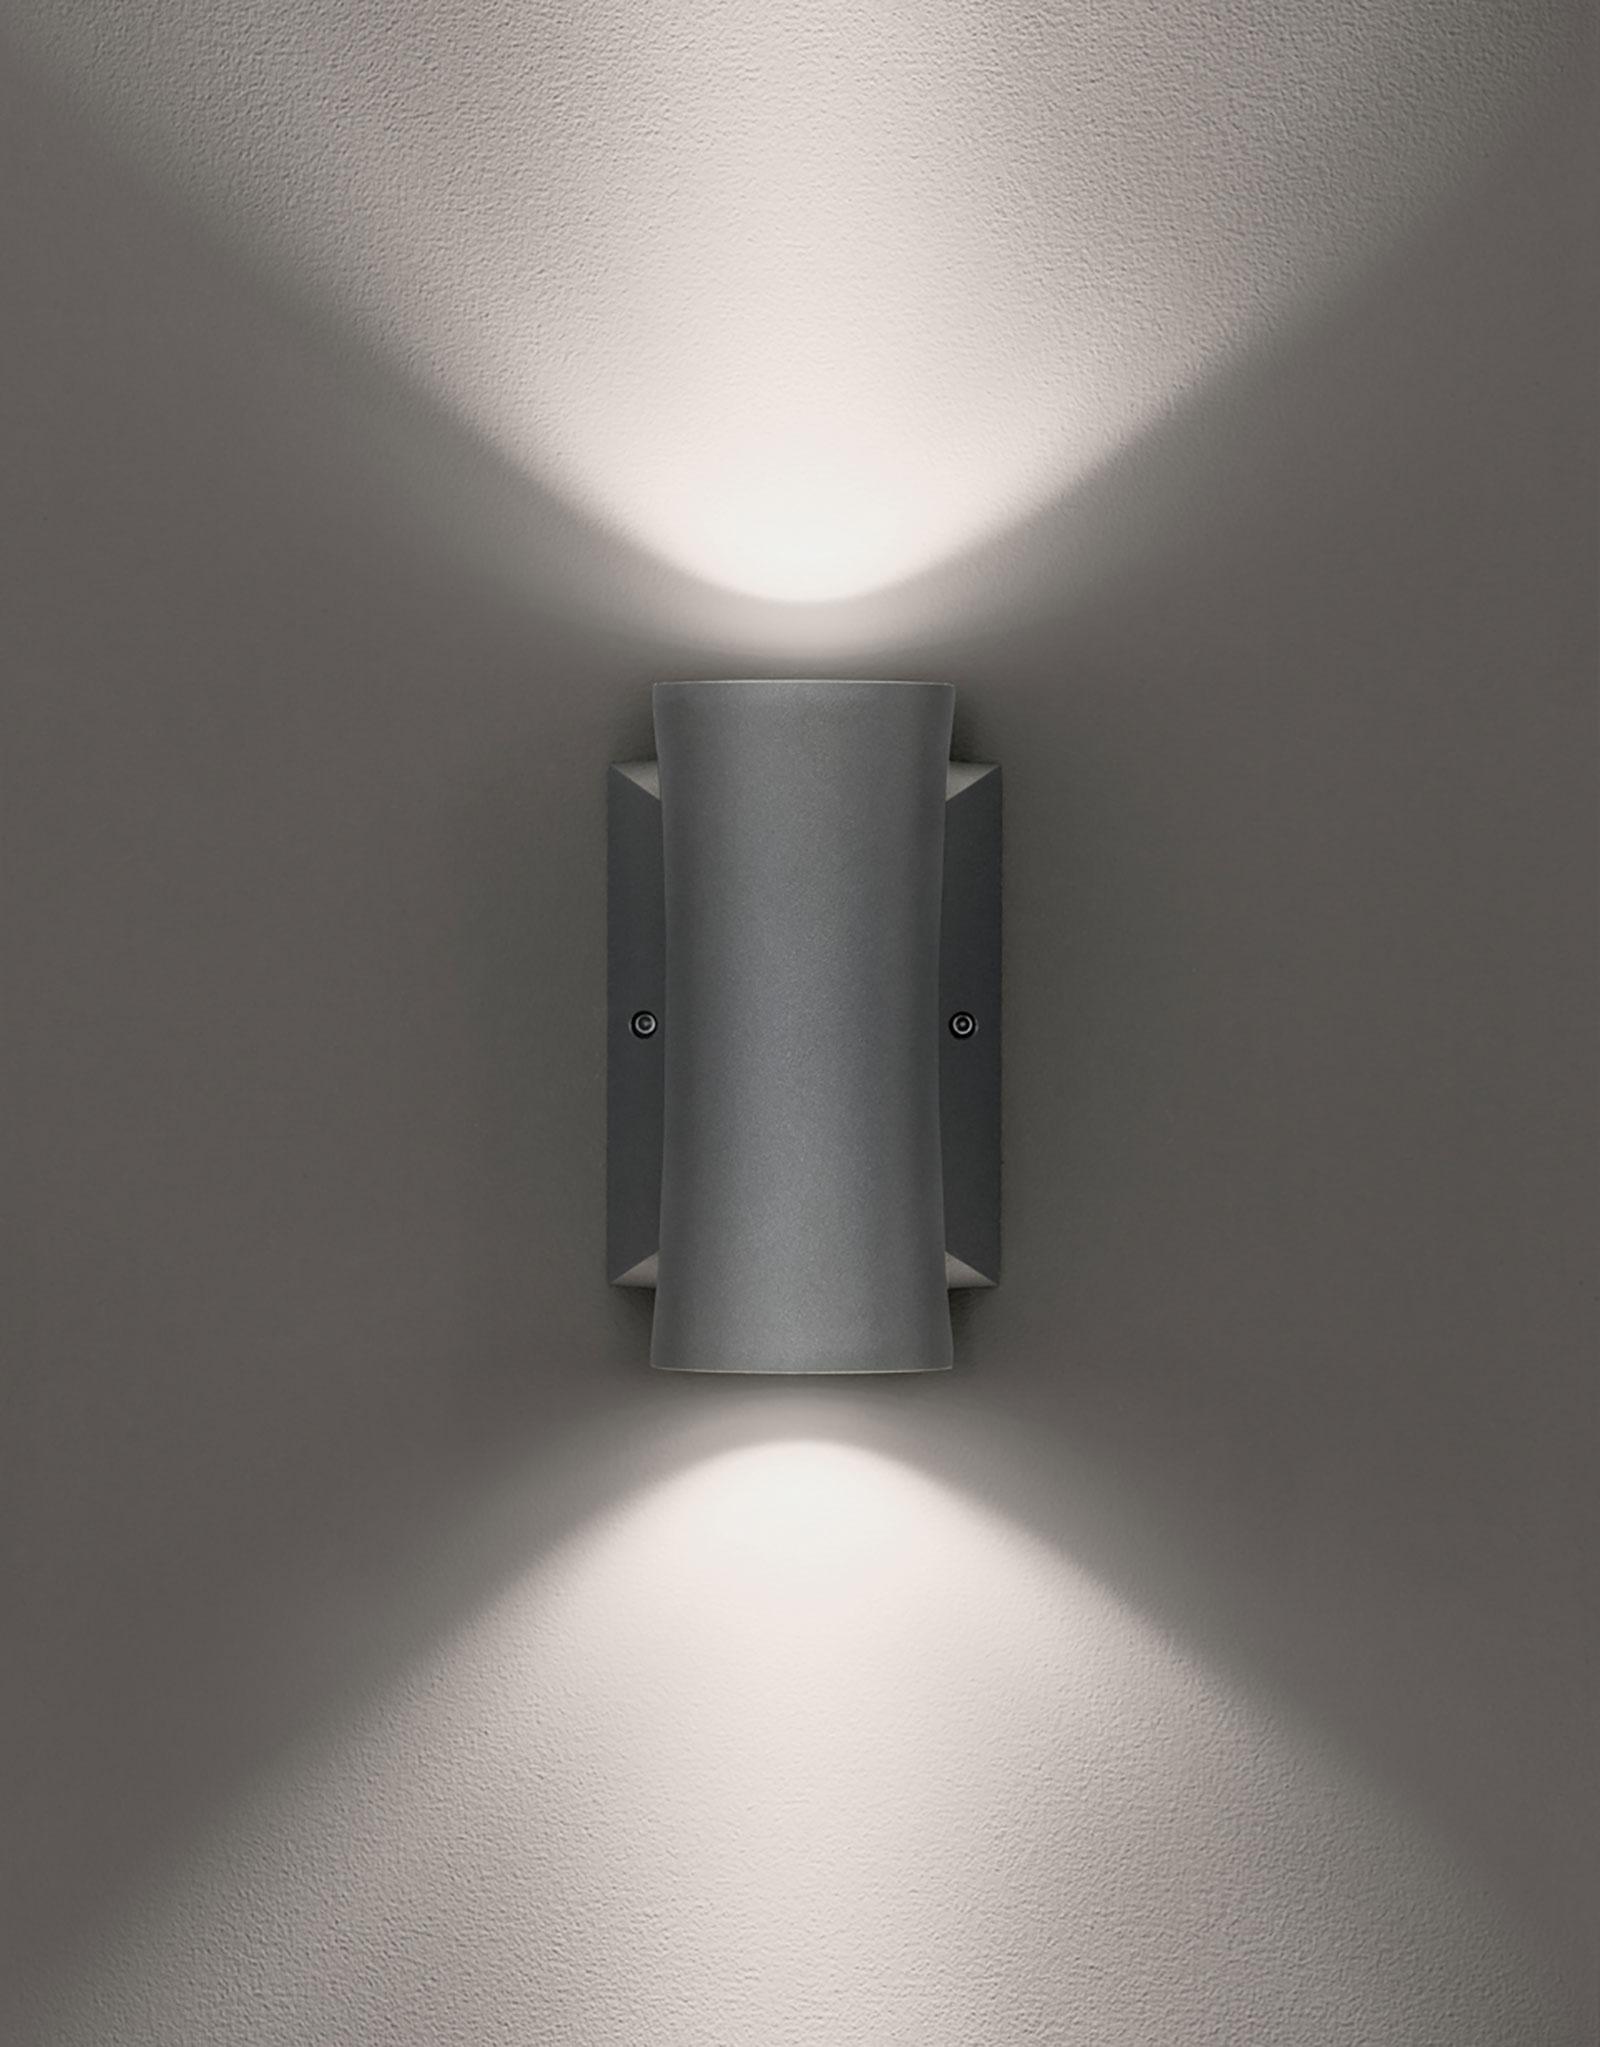 vega sconce ocl architectural lighting